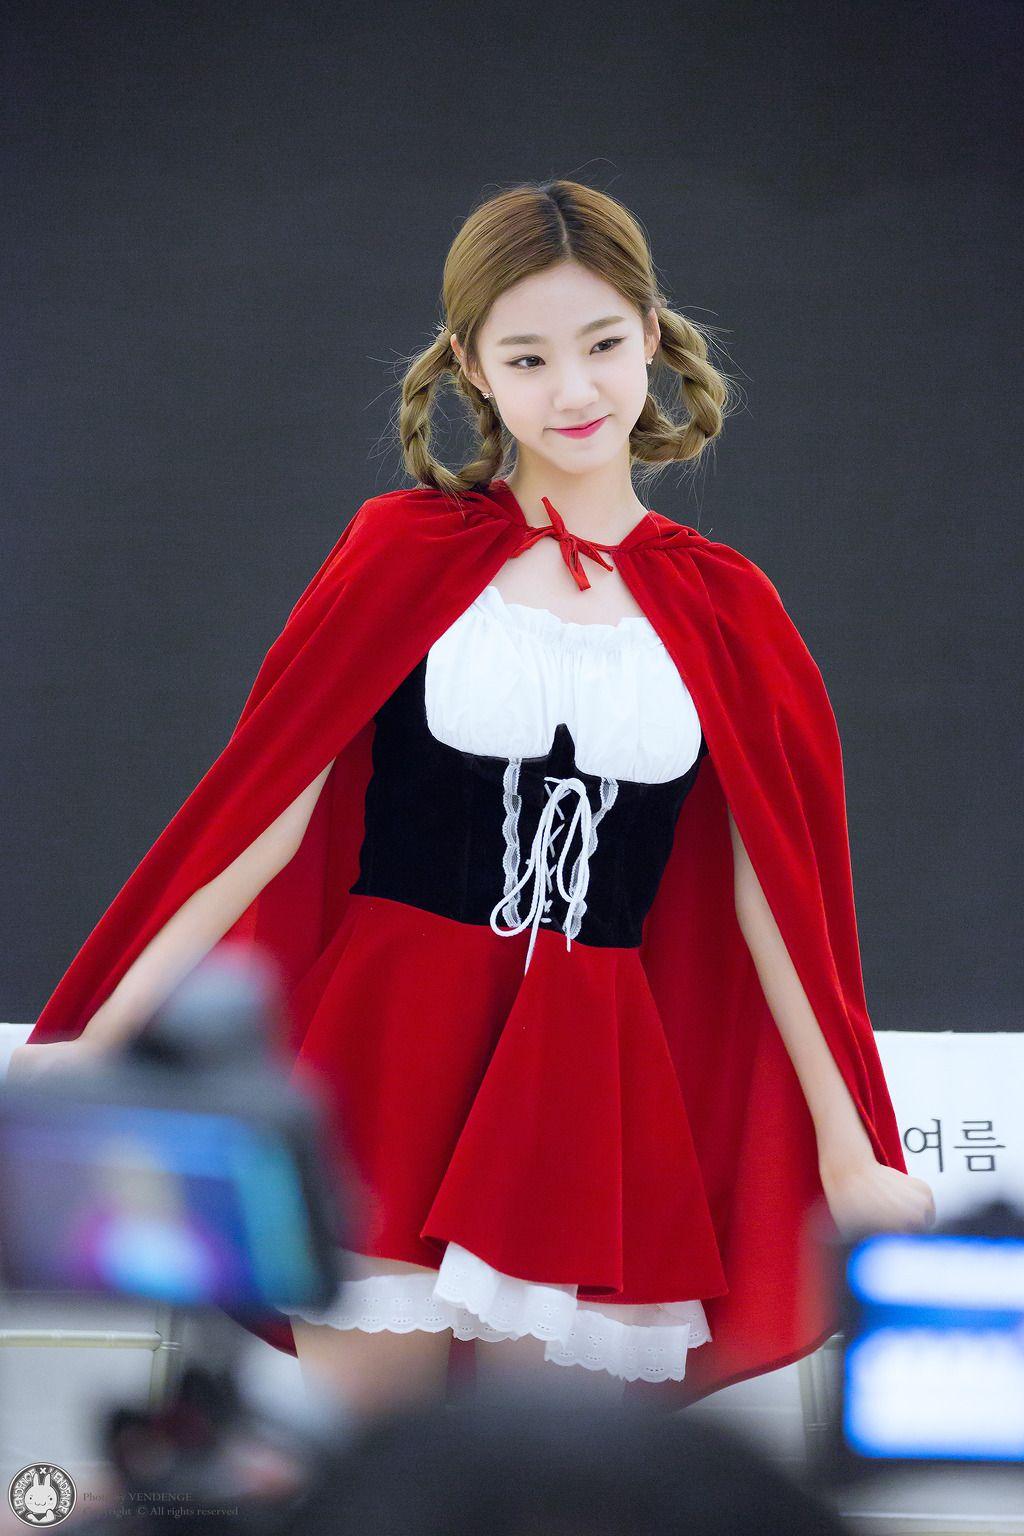 WJSN - Yeoreum #여름 (Lee Jinsook #이진숙) at 'Would you like girls' fanmeeting 160602 Mnet #우주소녀 #우주LIKE소녀 팬 간담회